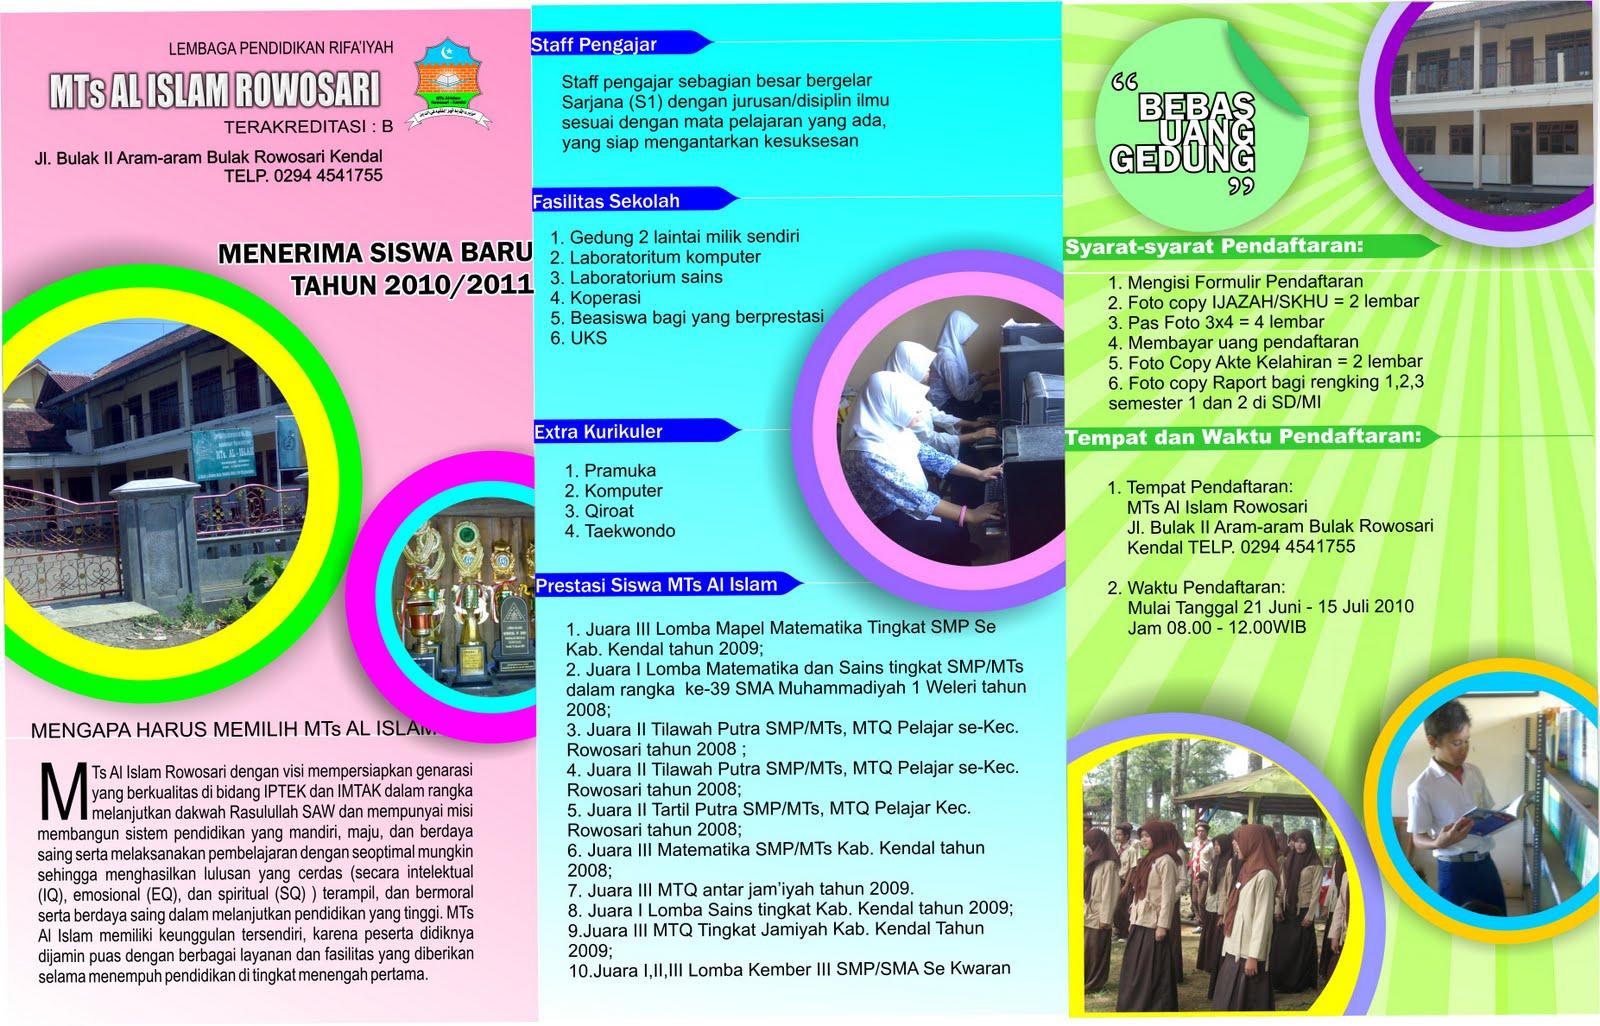 Jasa Advertising Kota Malang Kios